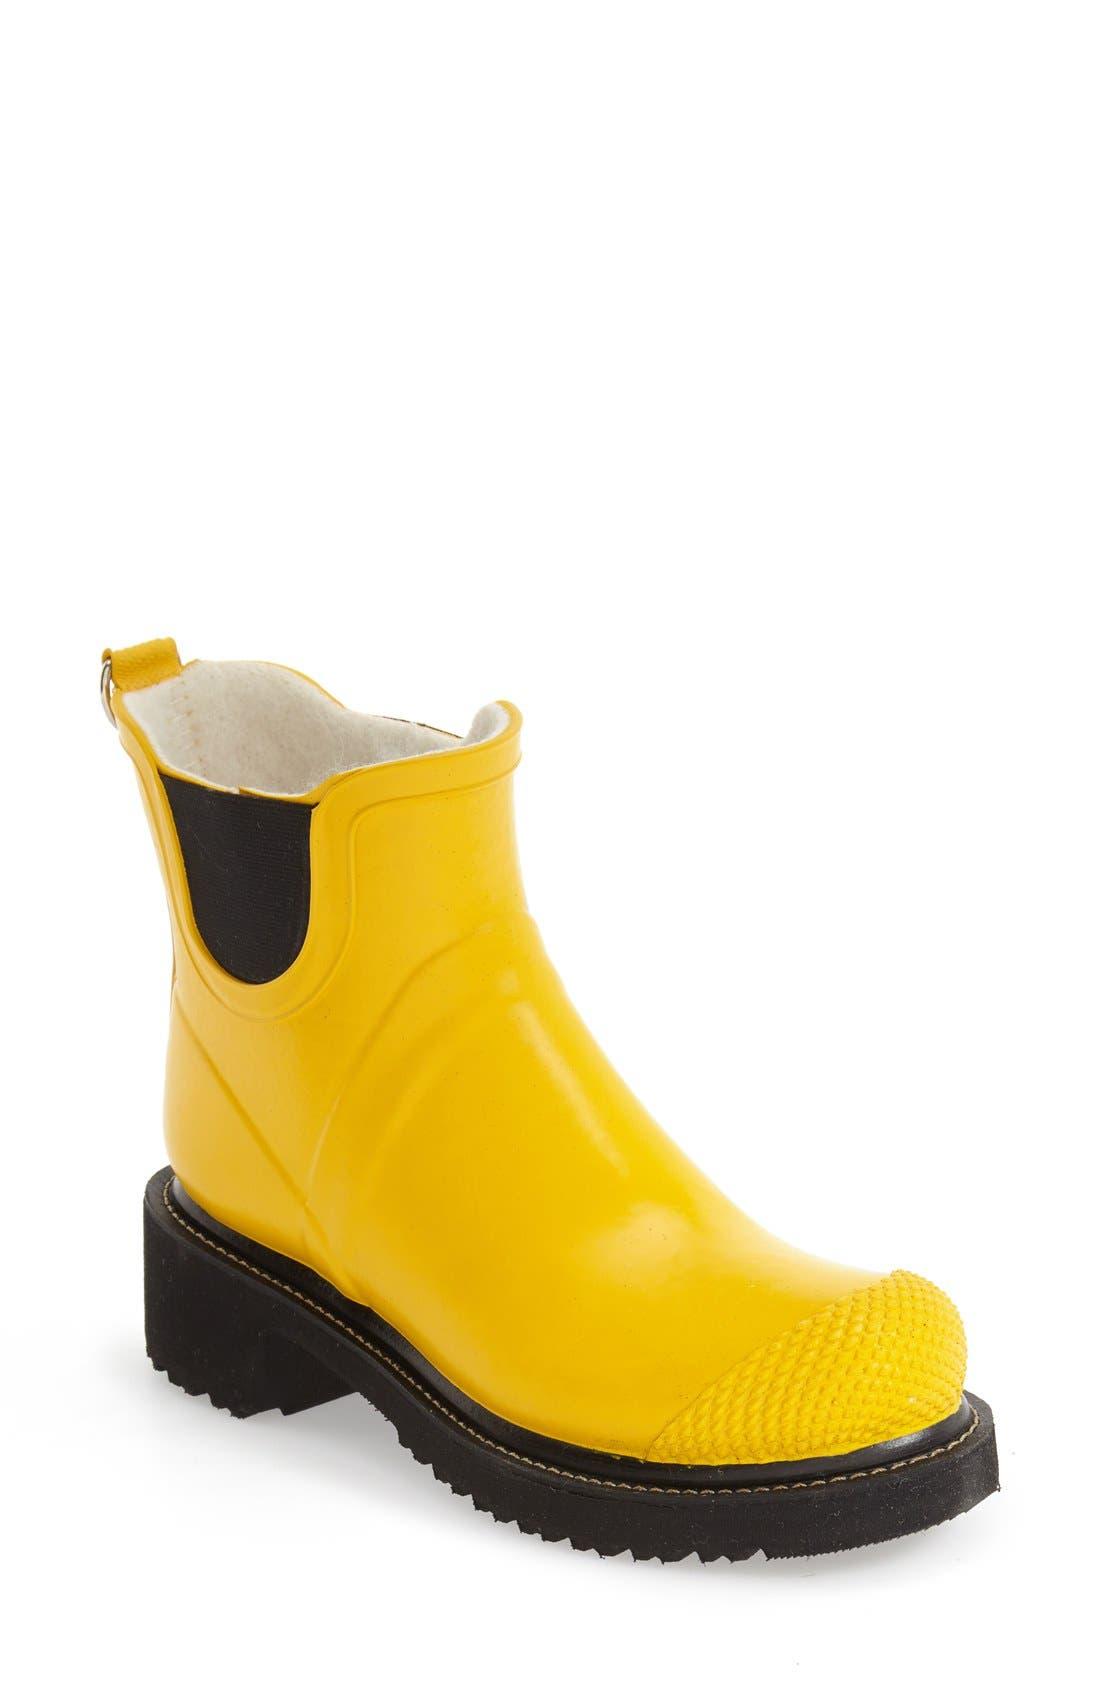 Main Image - Ilse Jacobsen Hornbaek 'RUB 47' Short Waterproof Rain Boot (Women)